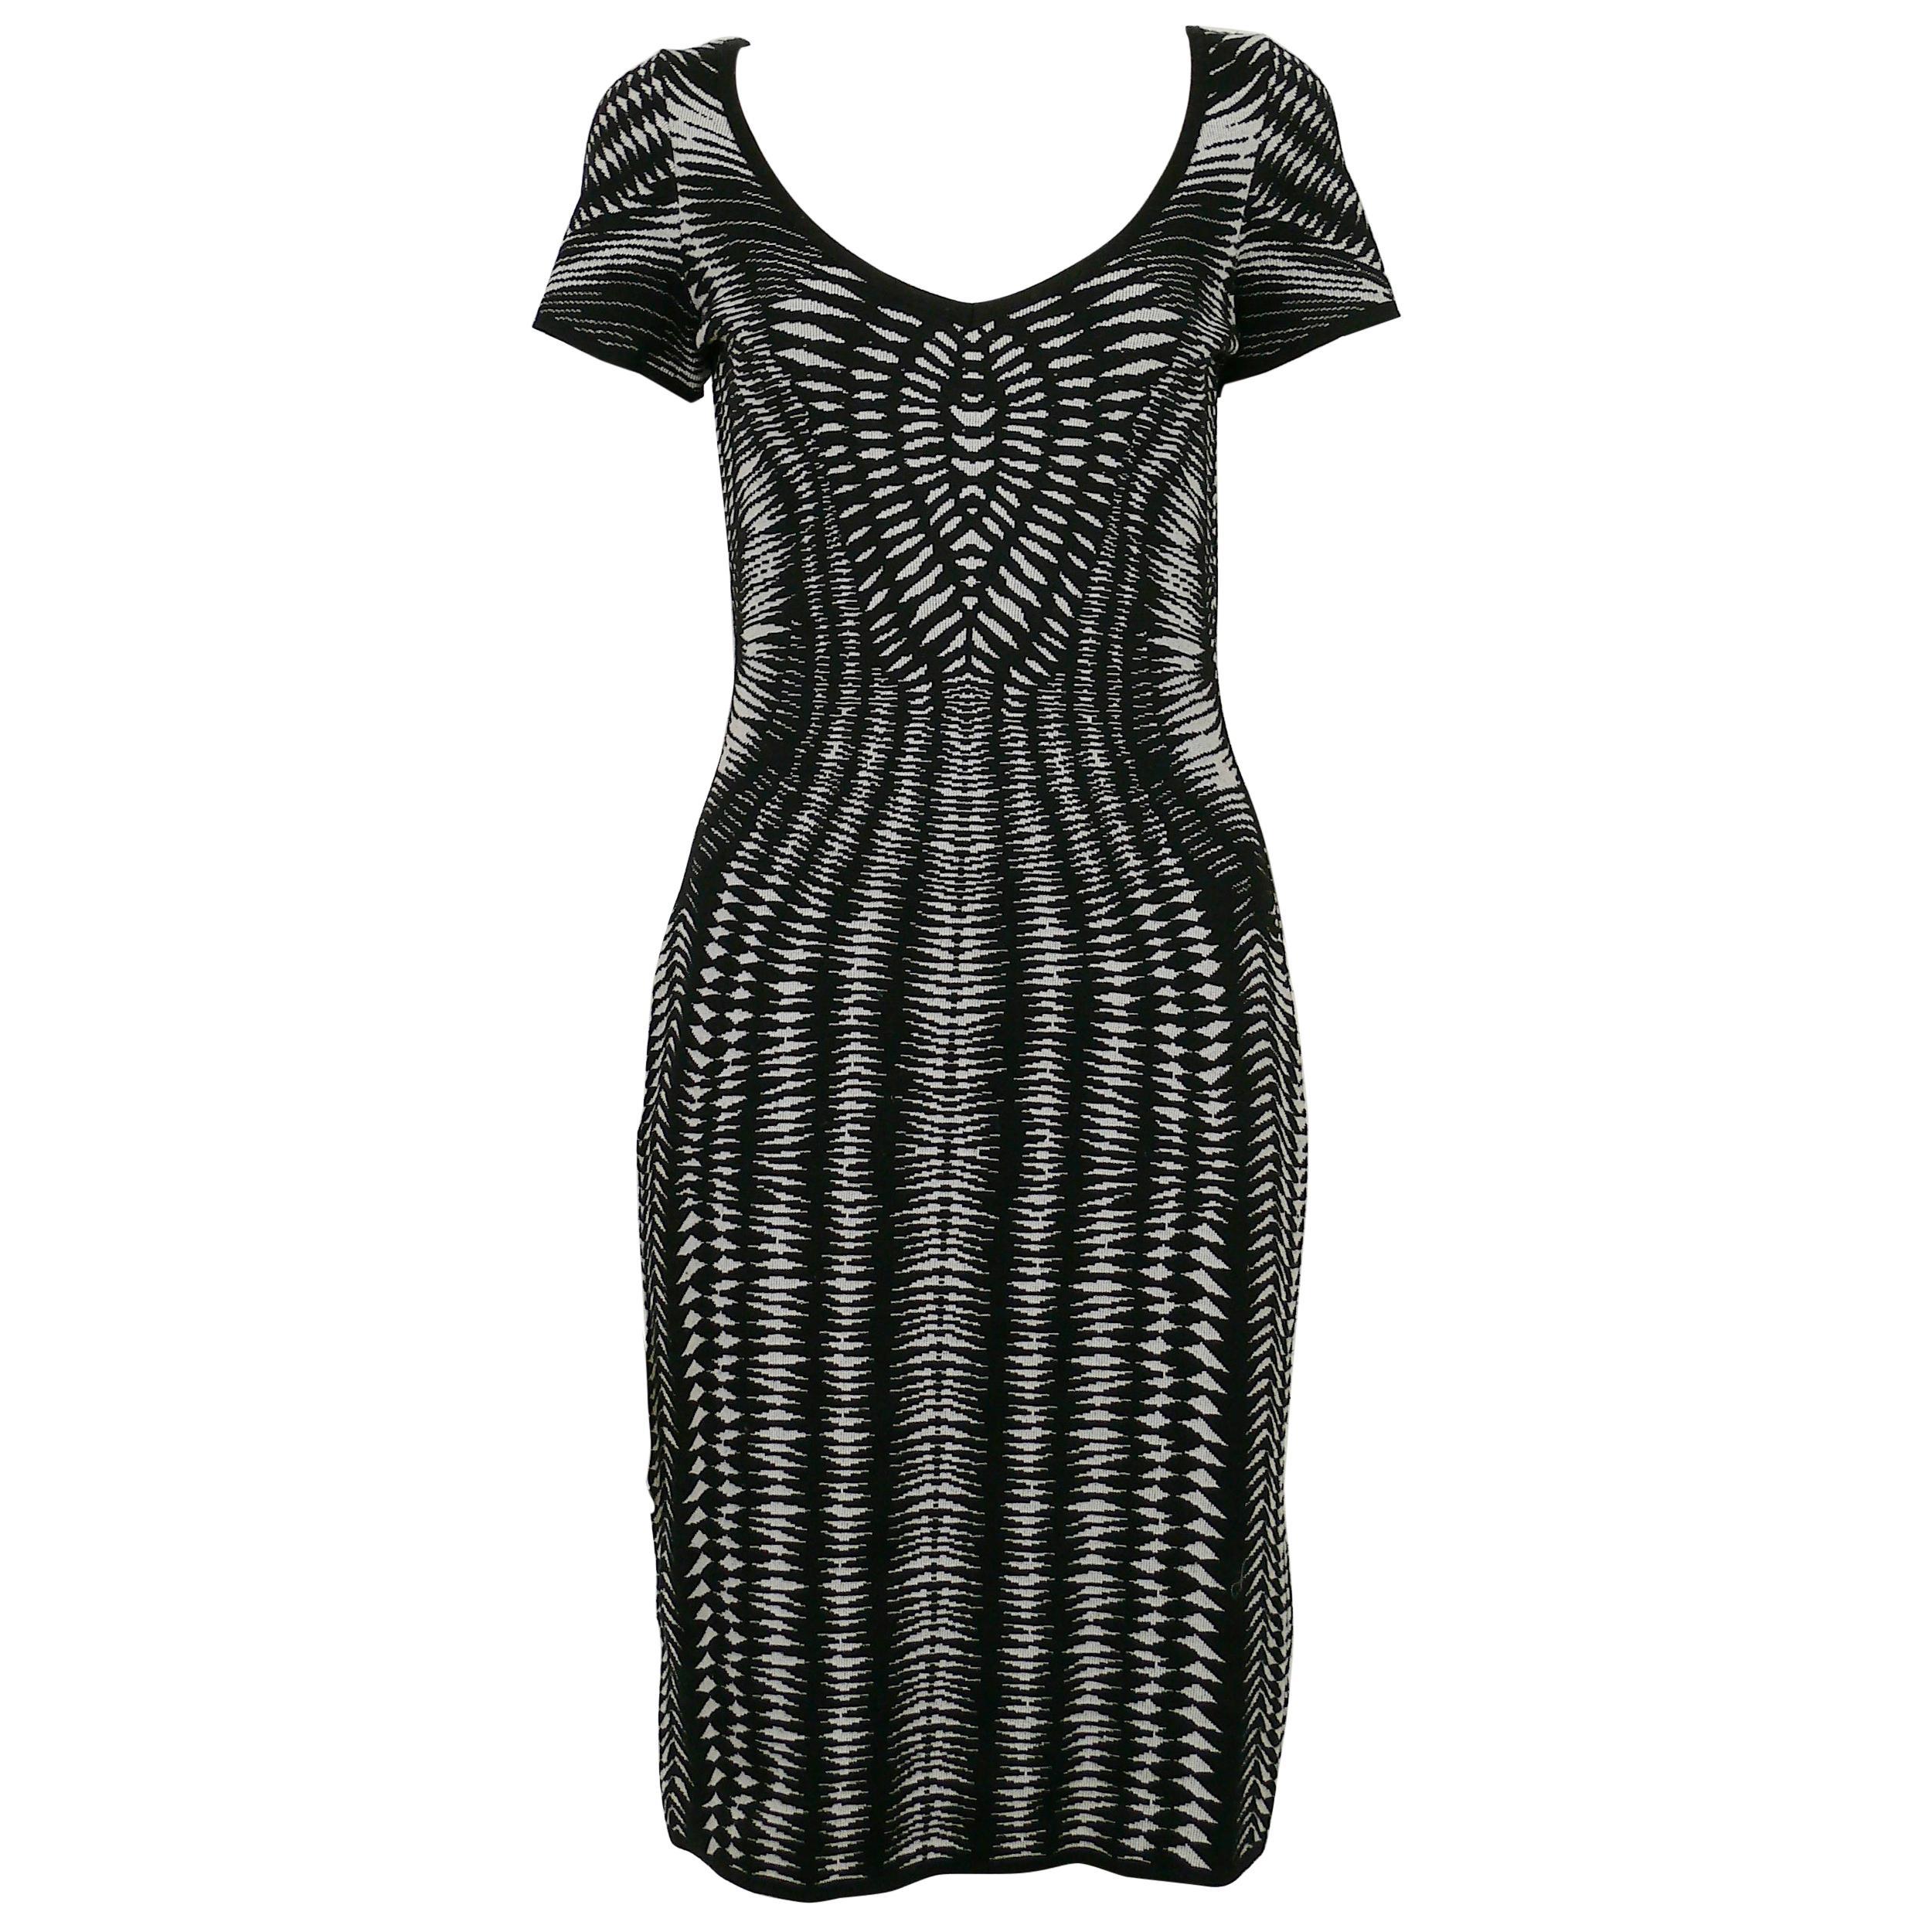 Mugler Vintage Black & White Kinetic Knitted Dress